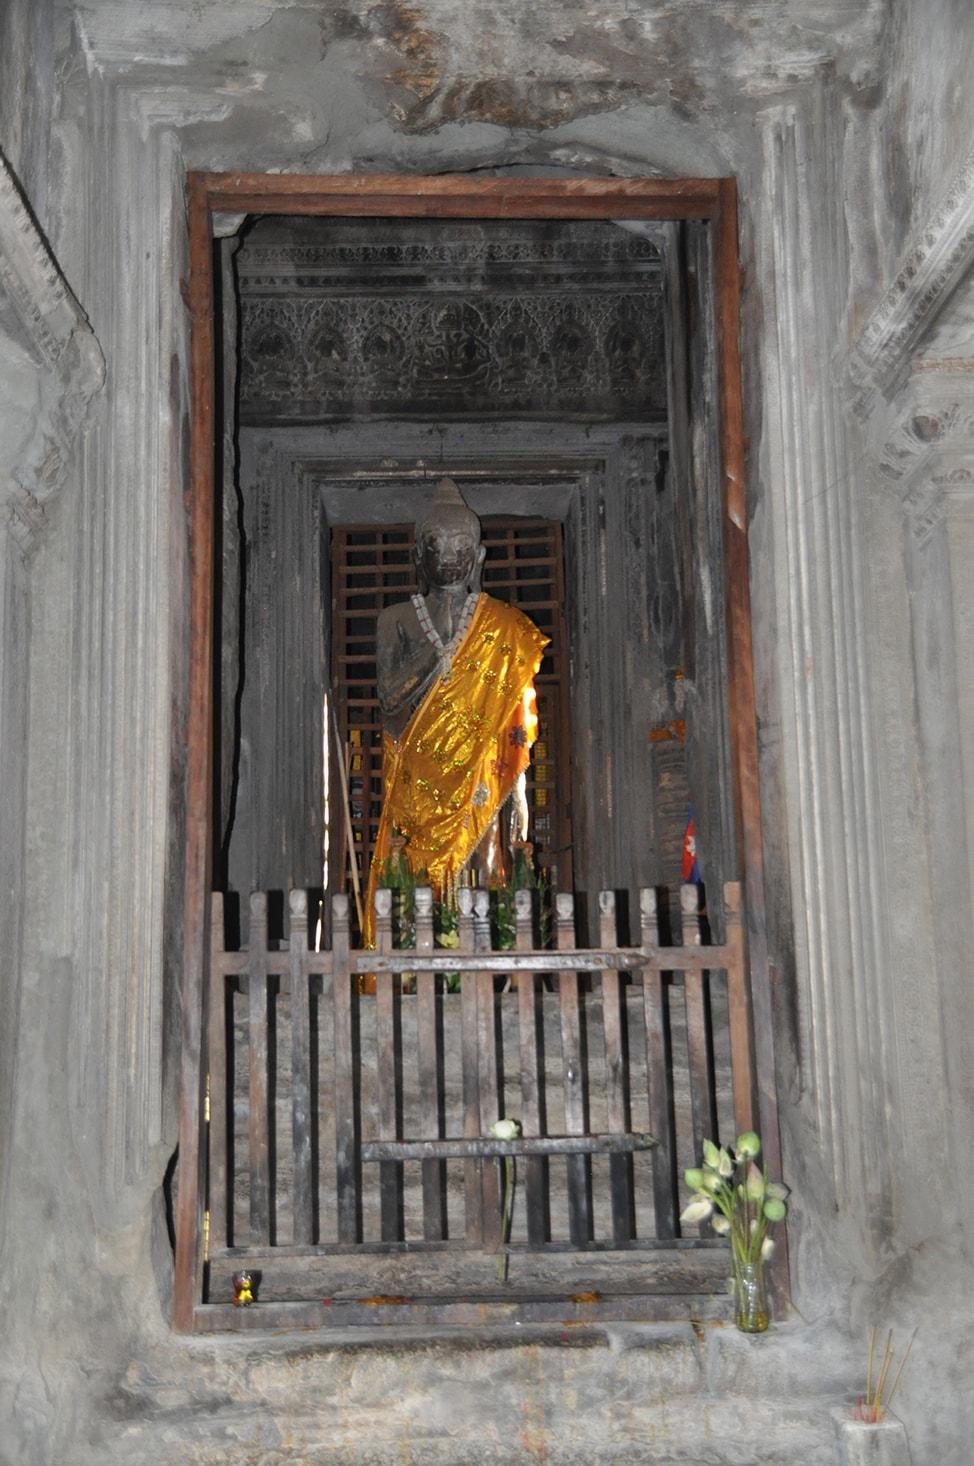 Image of Buddha statue draped in gold fabric